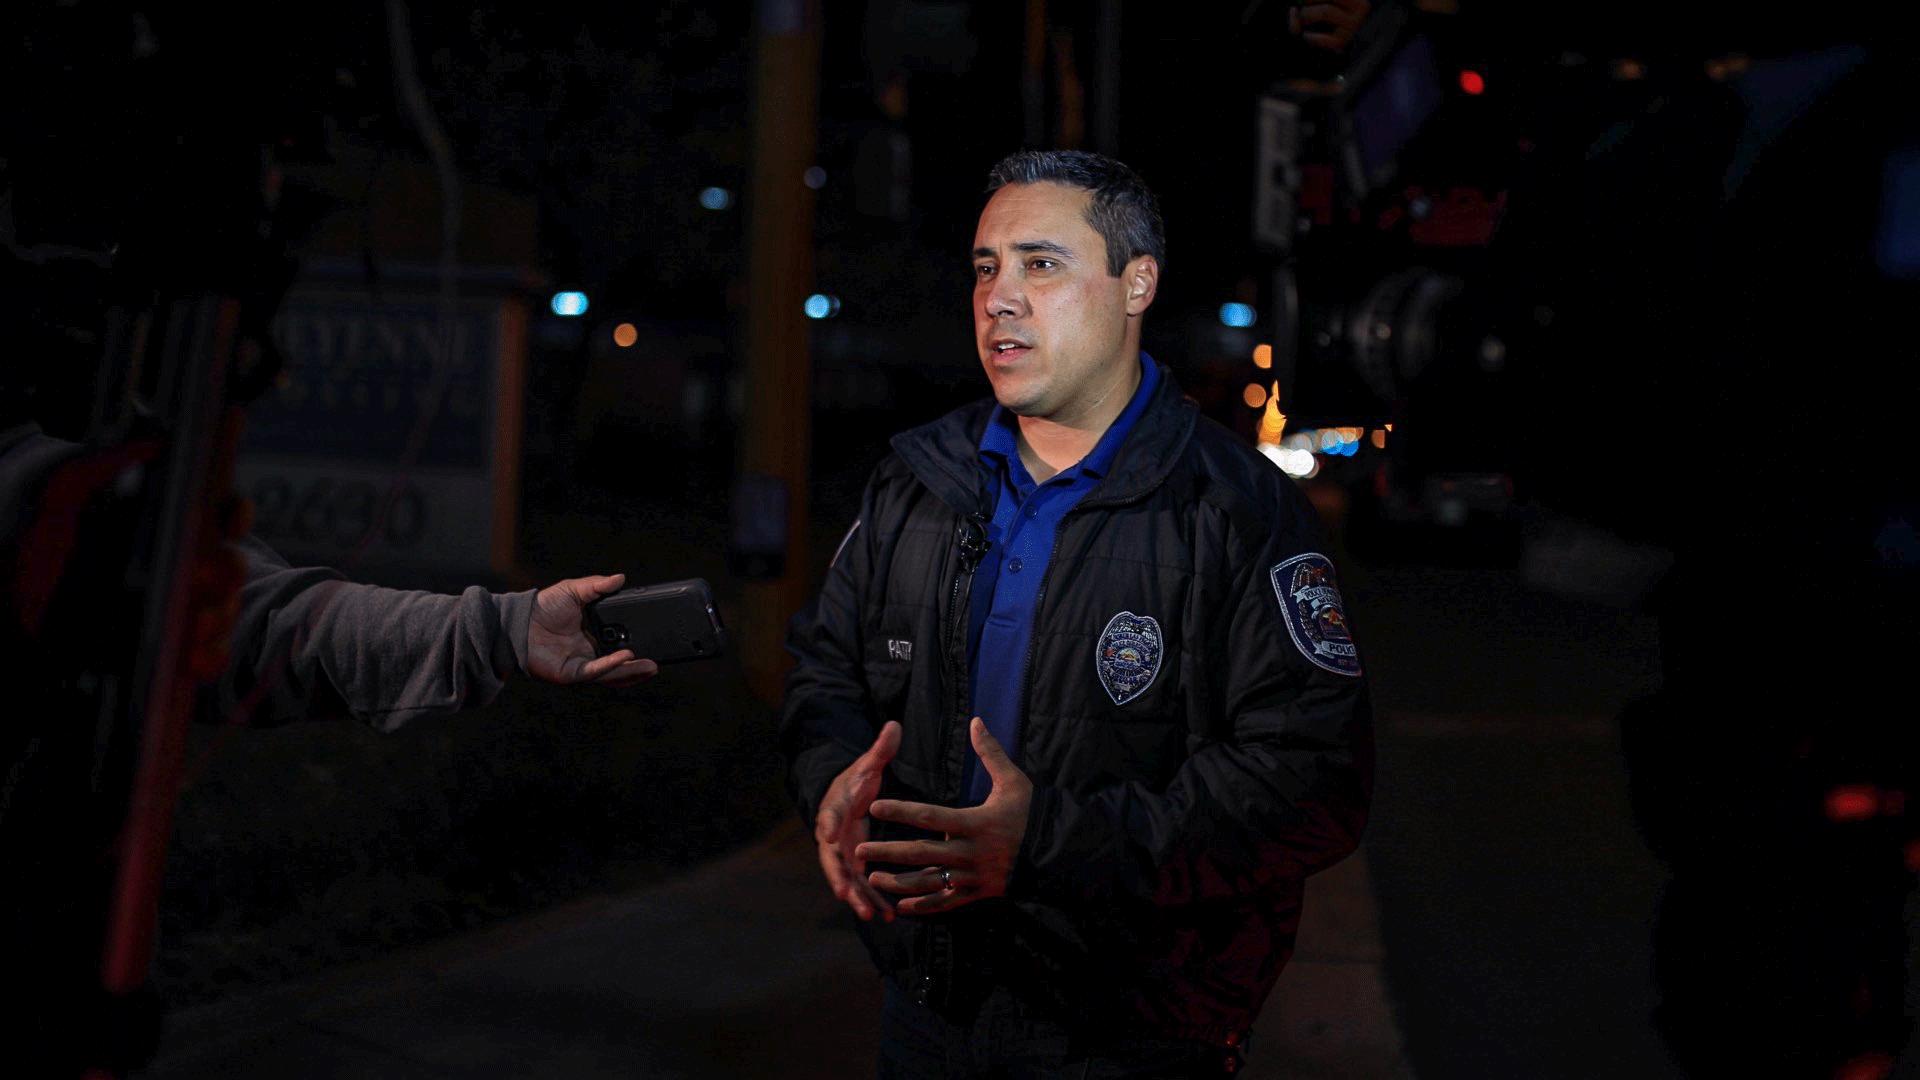 North Las Vegas Public Information Officer Aaron Patty briefs the media on the crash. (Gai Phanalasy/FOX5)